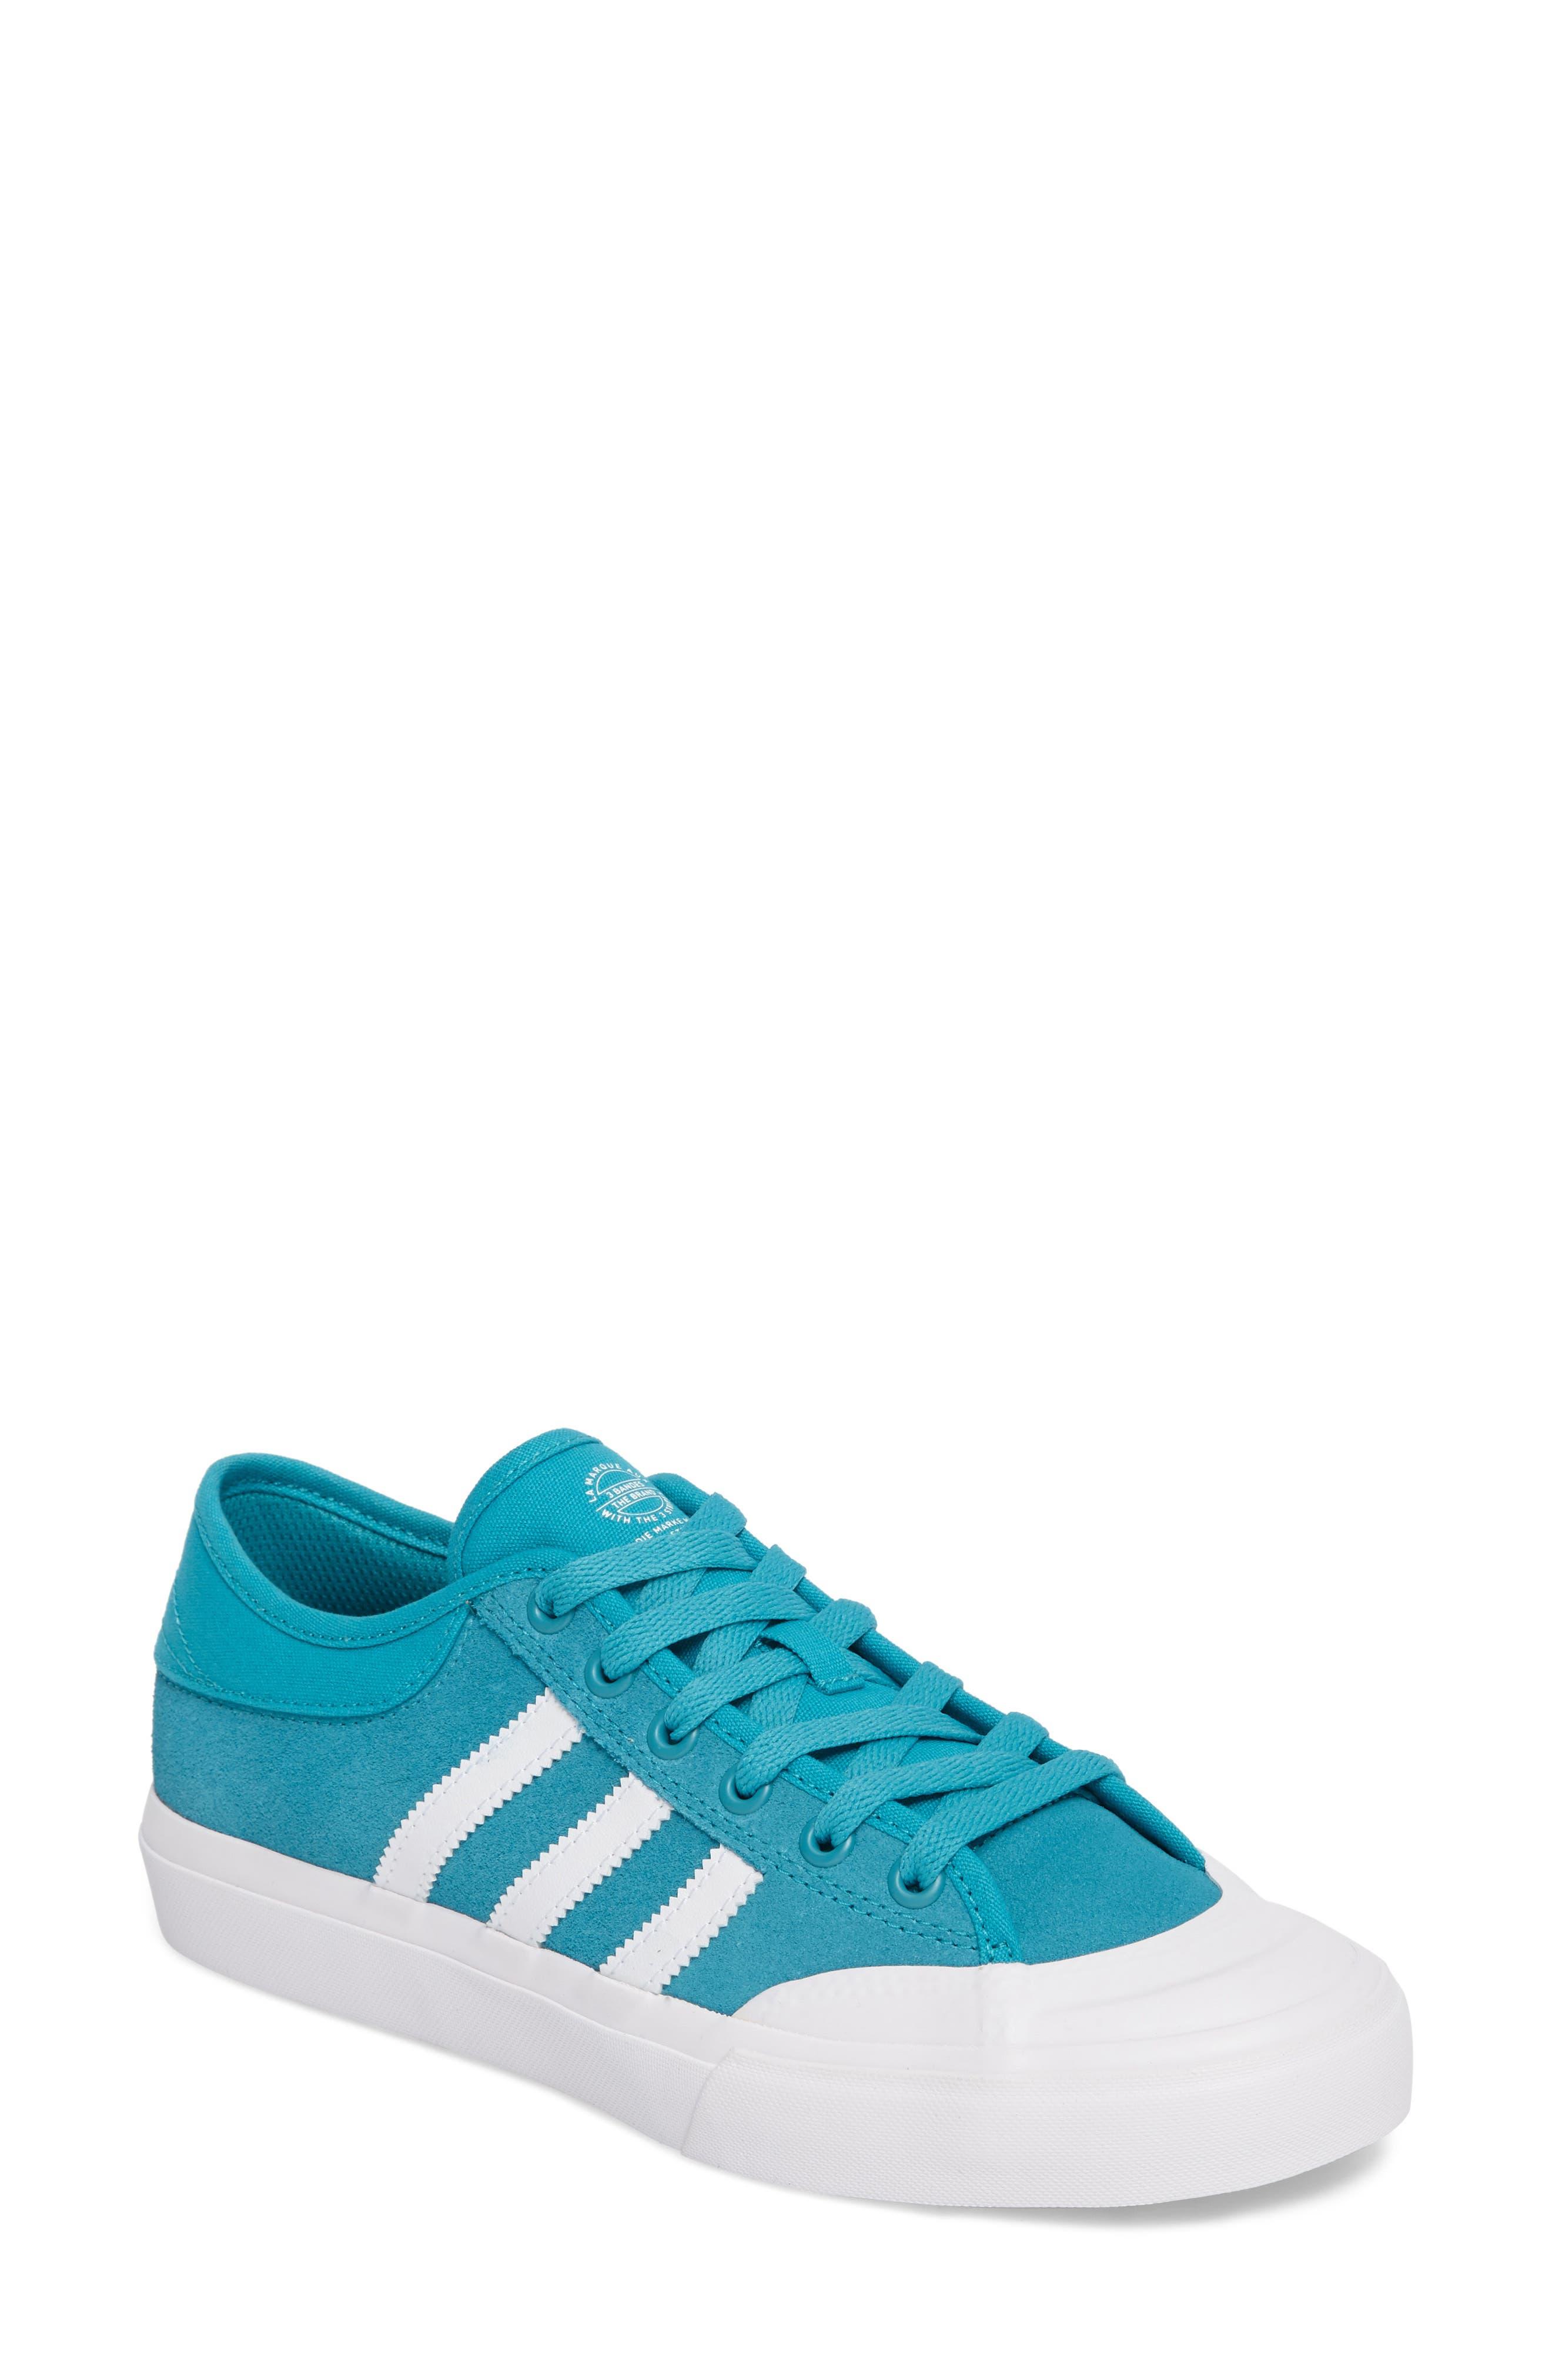 ADIDAS,                             Matchcourt Mid High Sneaker,                             Main thumbnail 1, color,                             400